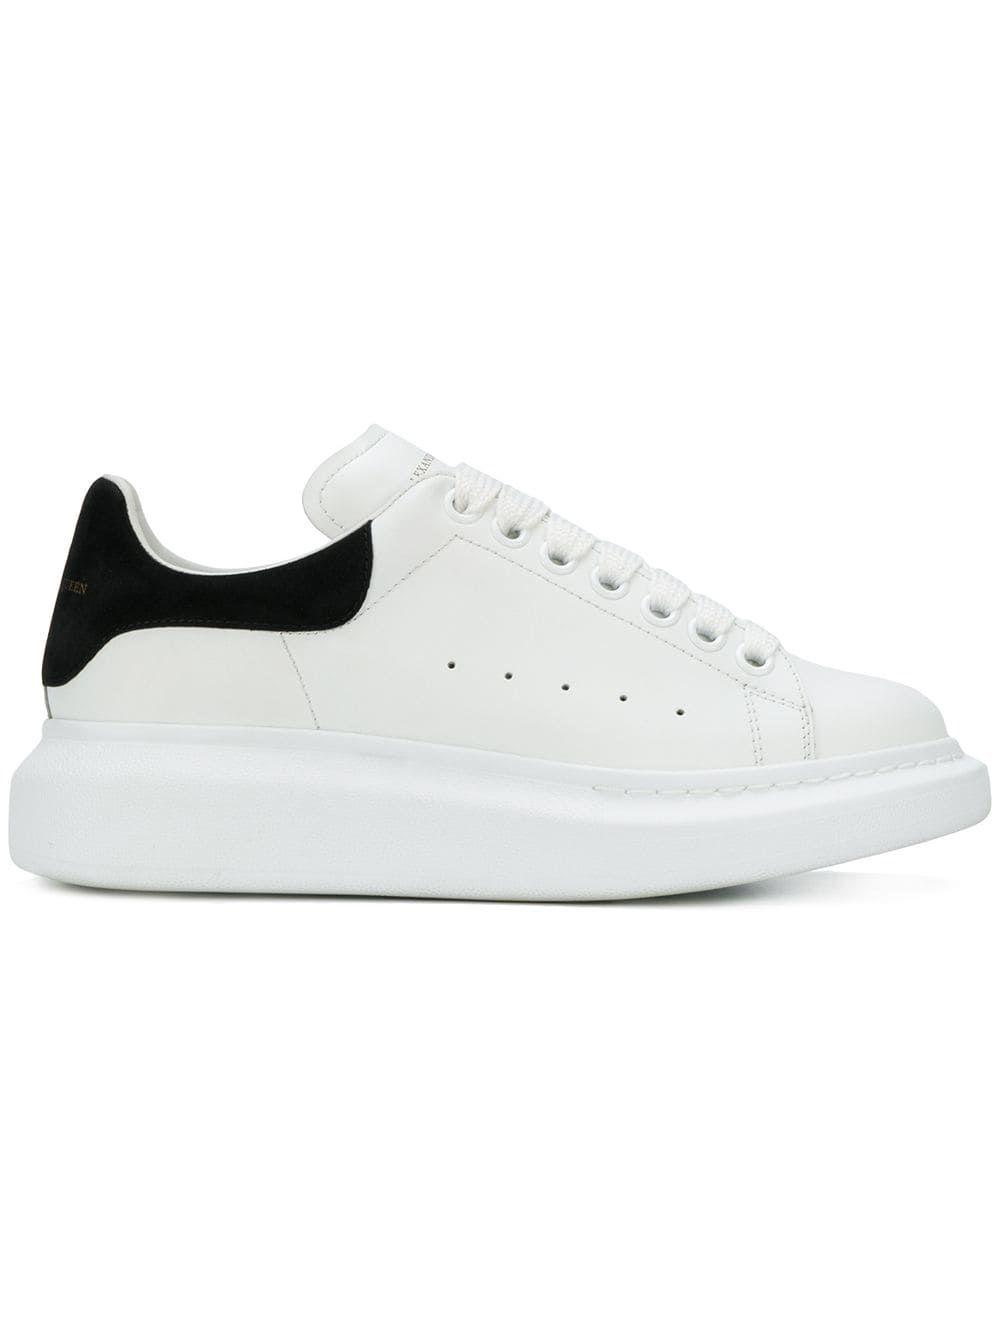 bianca adidas scarpe da ginnastica girls